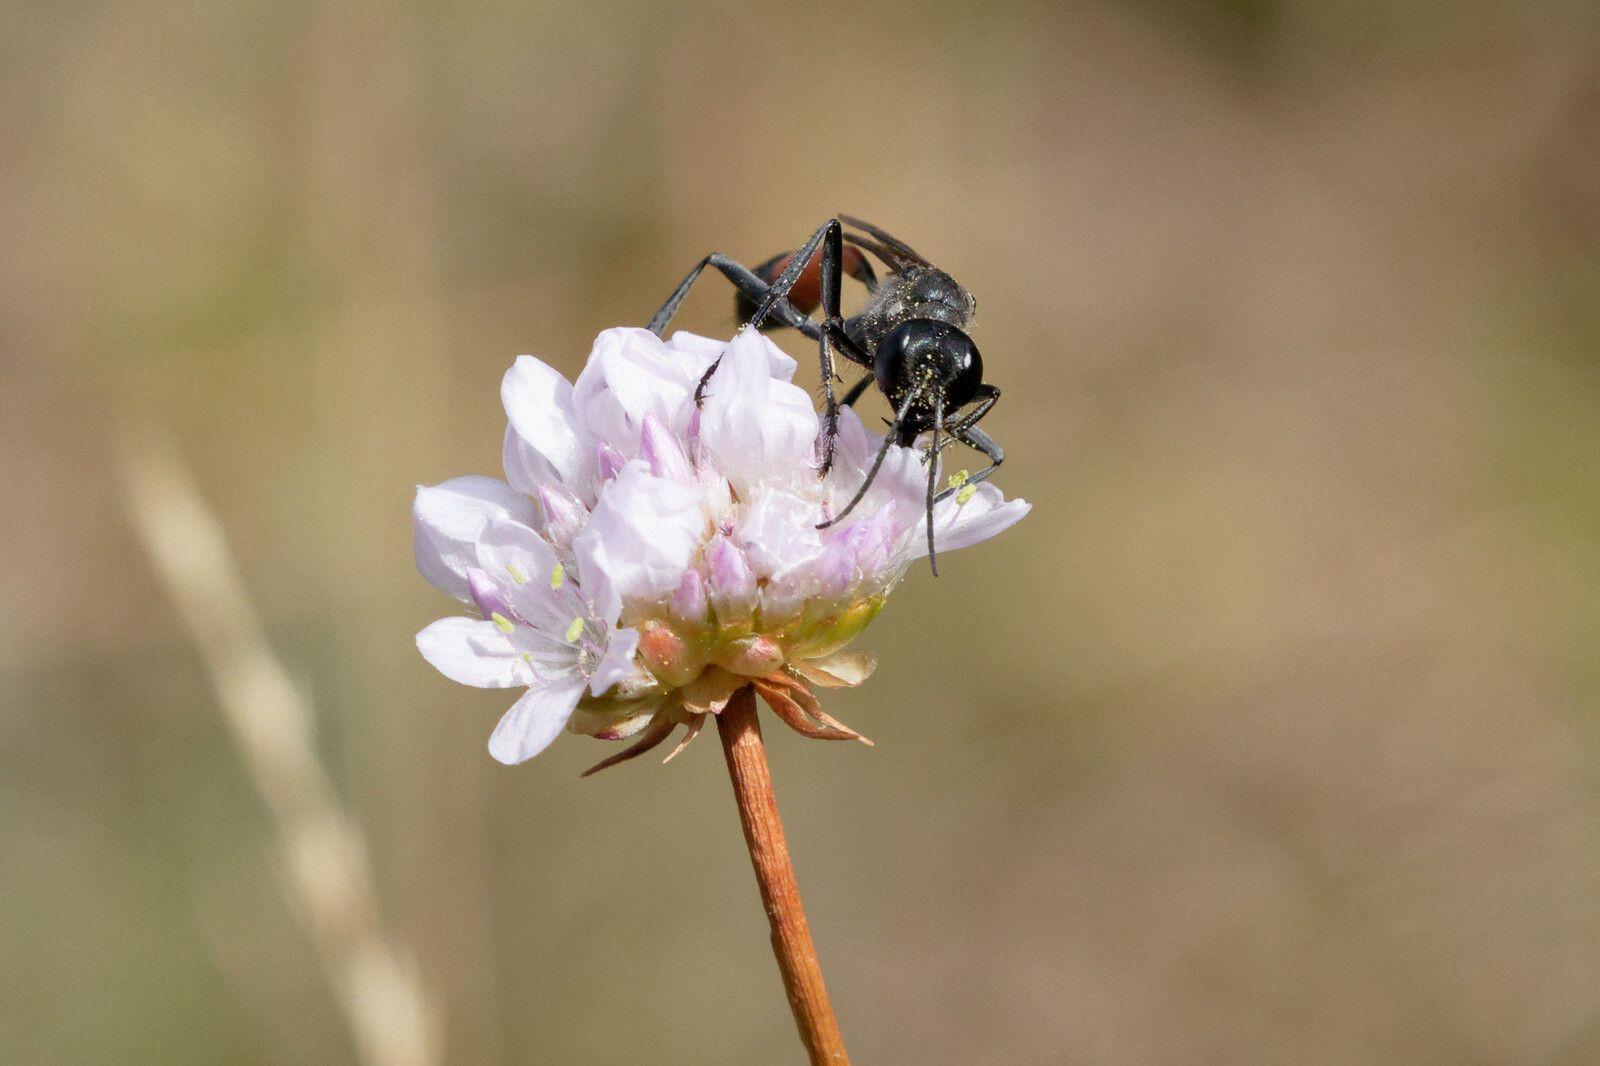 Ammophile des sables (Ammophila sabulosa)